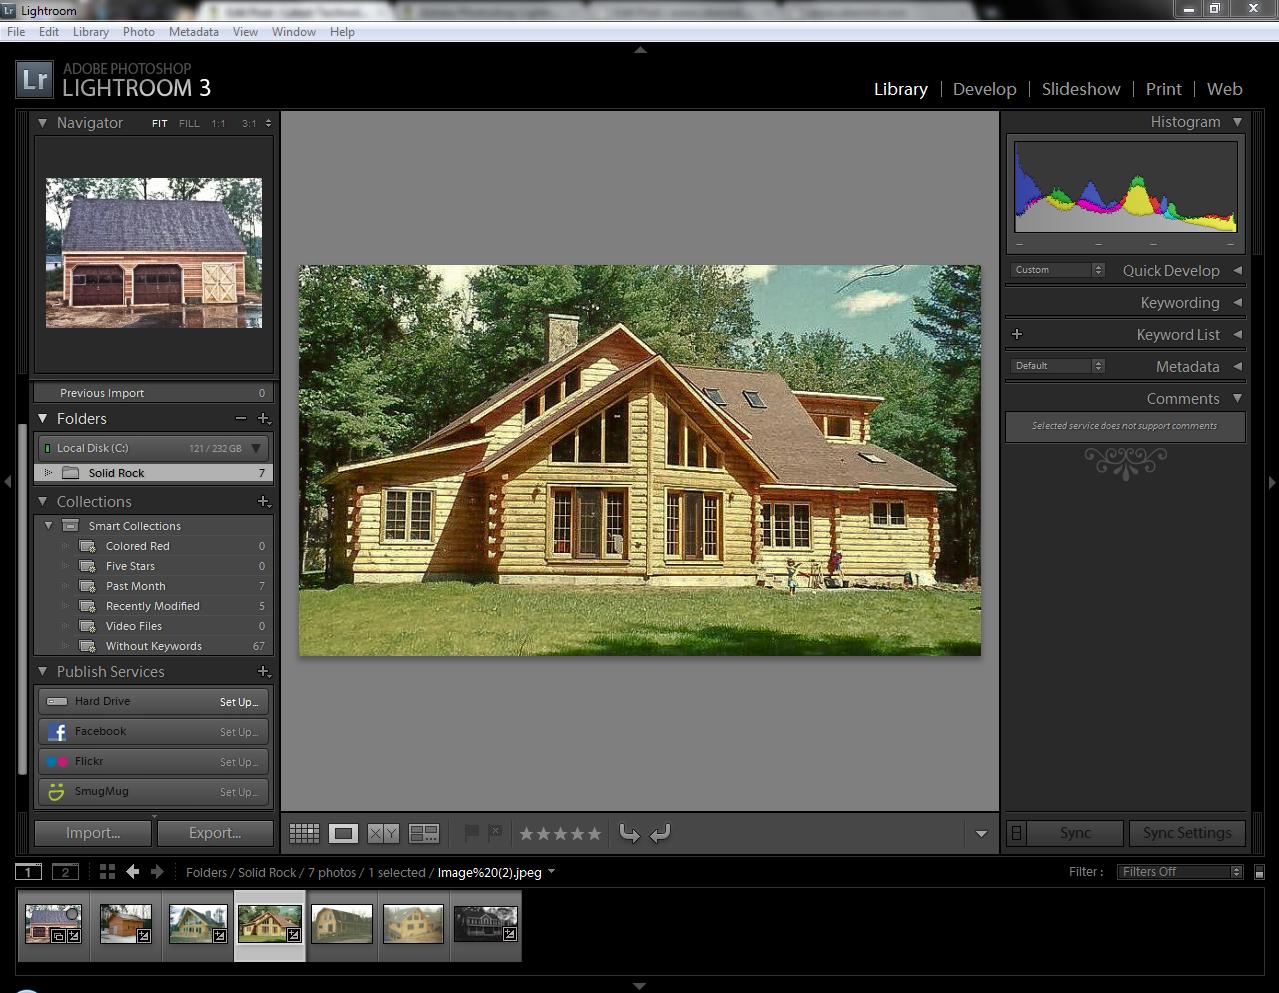 Adobe Photoshop Lightroom 3 Library